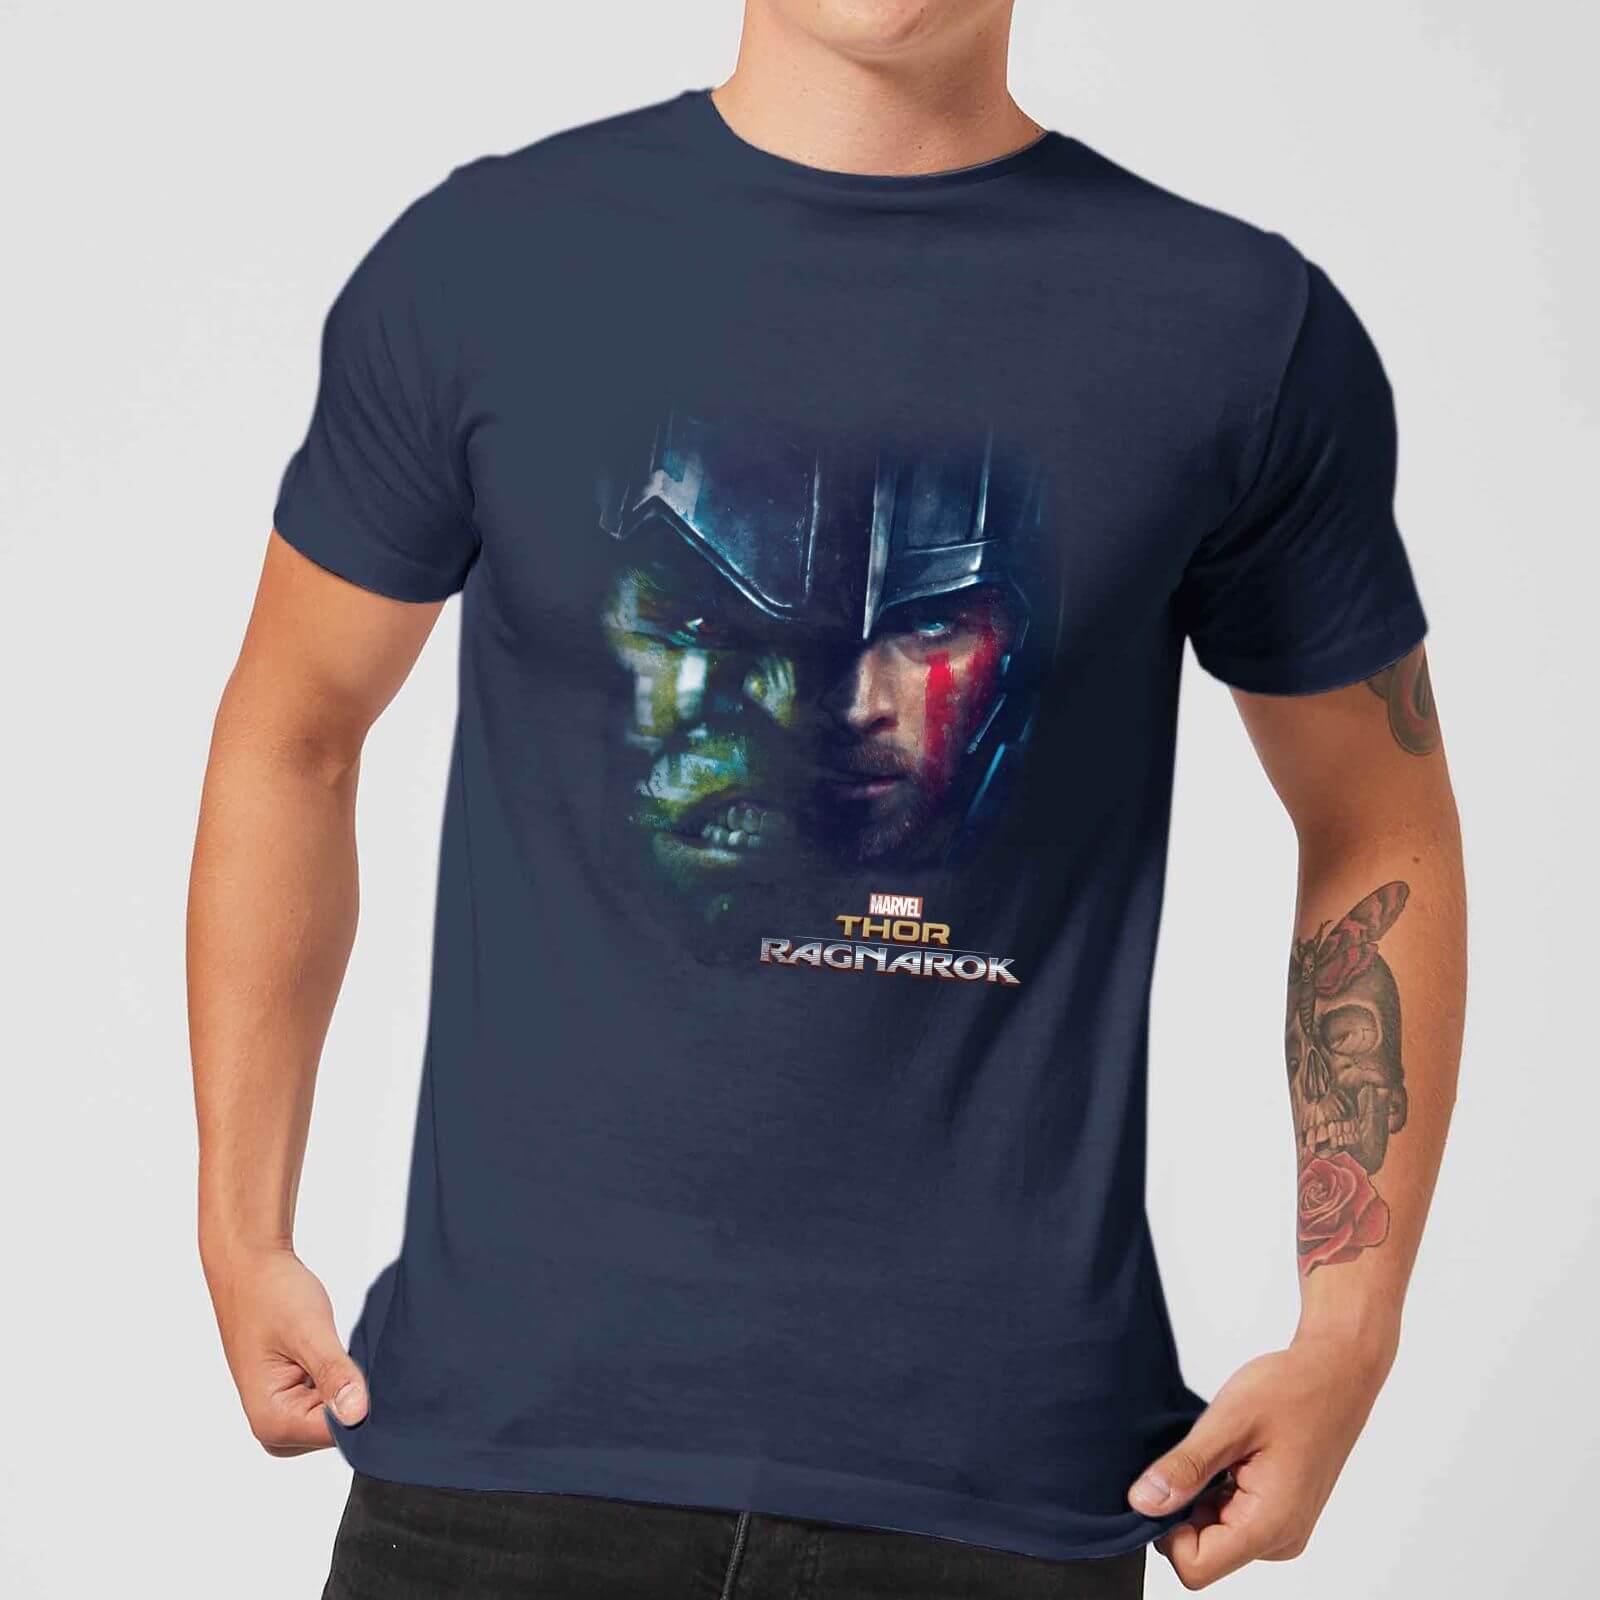 OfferteWeb.click 28-t-shirt-marvel-thor-ragnarok-hulk-split-face-navy-uomo